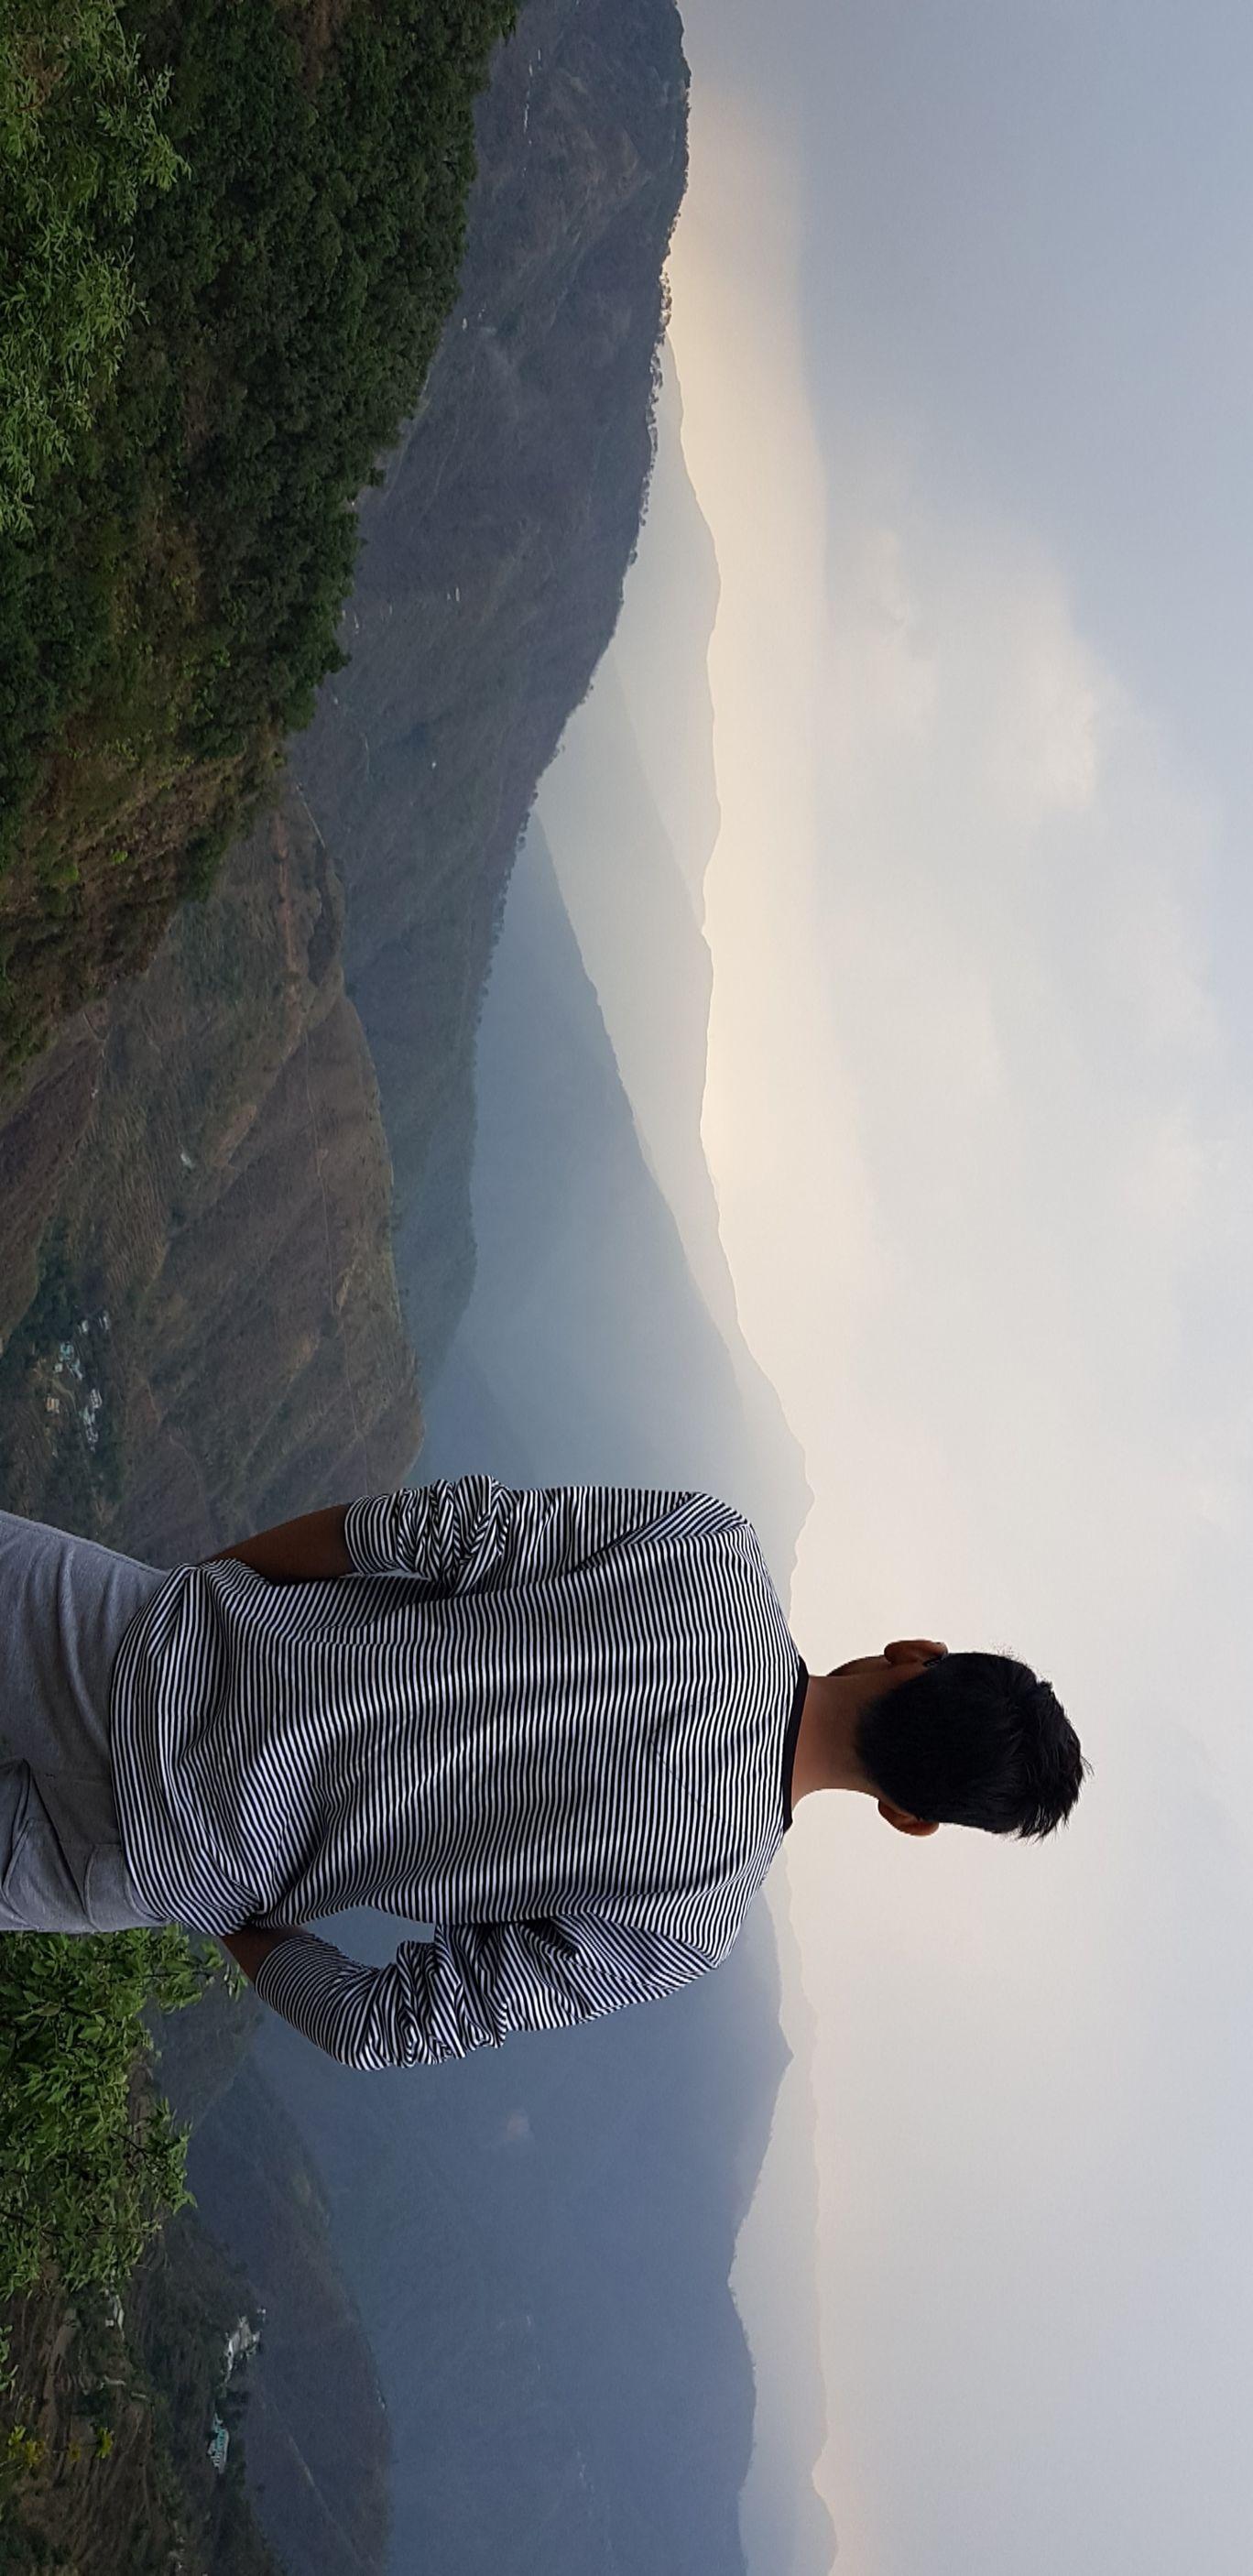 Photo of Dhanaulti By Pranav Lohiya